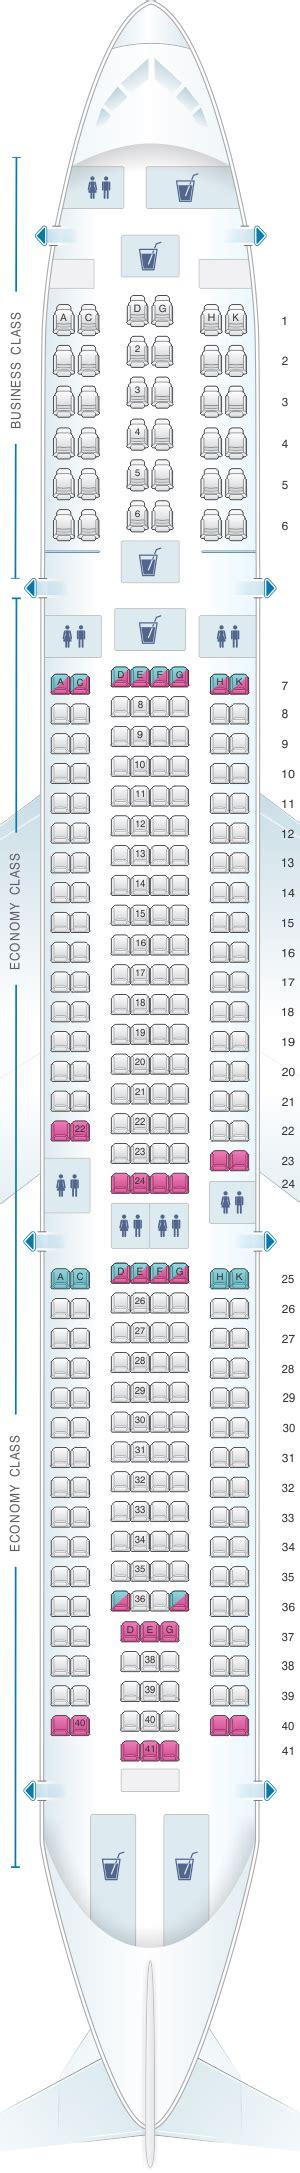 siege boeing 777 plan de cabine egyptair airbus a330 300 seatmaestro fr